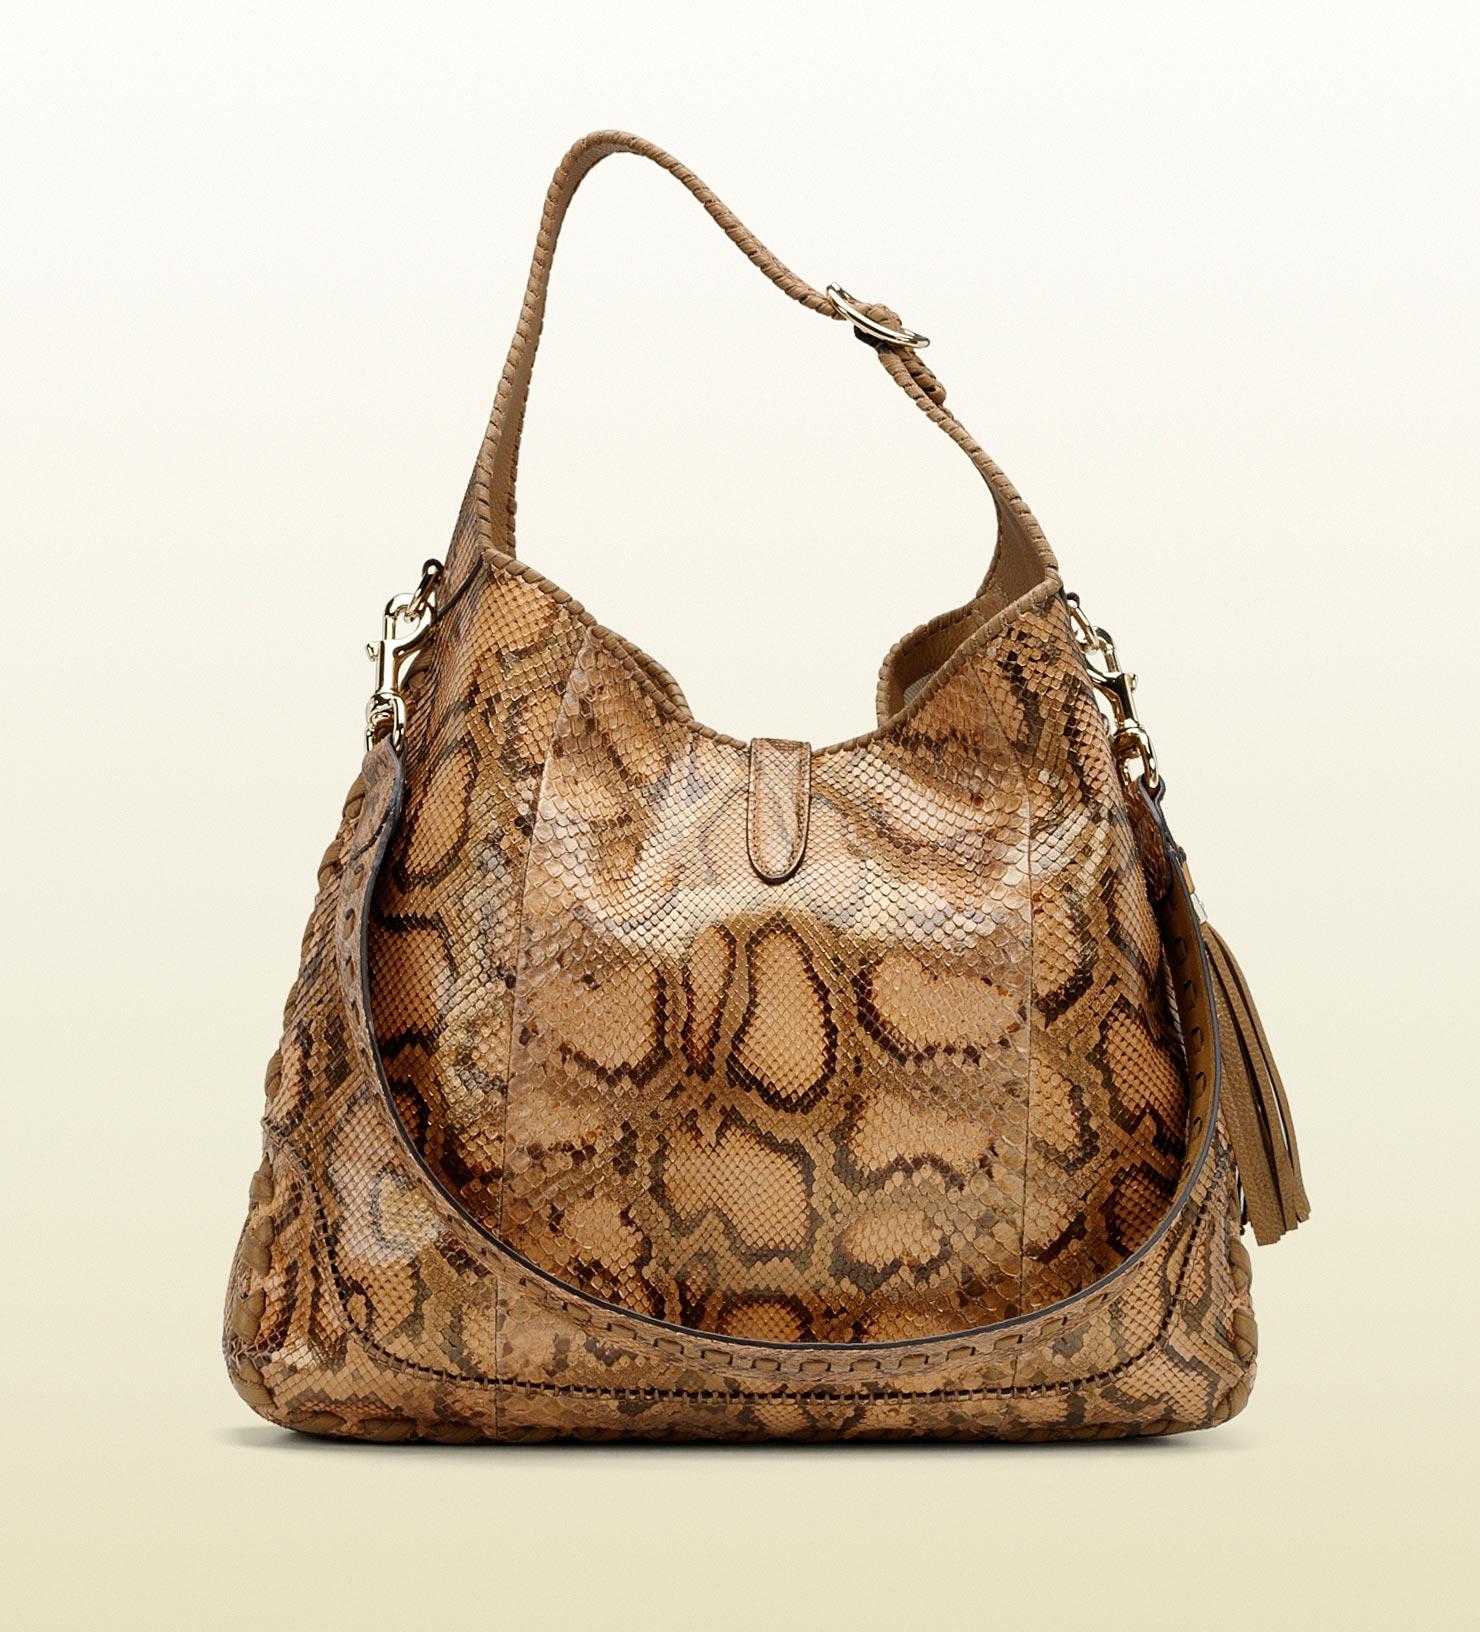 ff070e026 Gucci New Jackie Python Shoulder Bag - Lyst